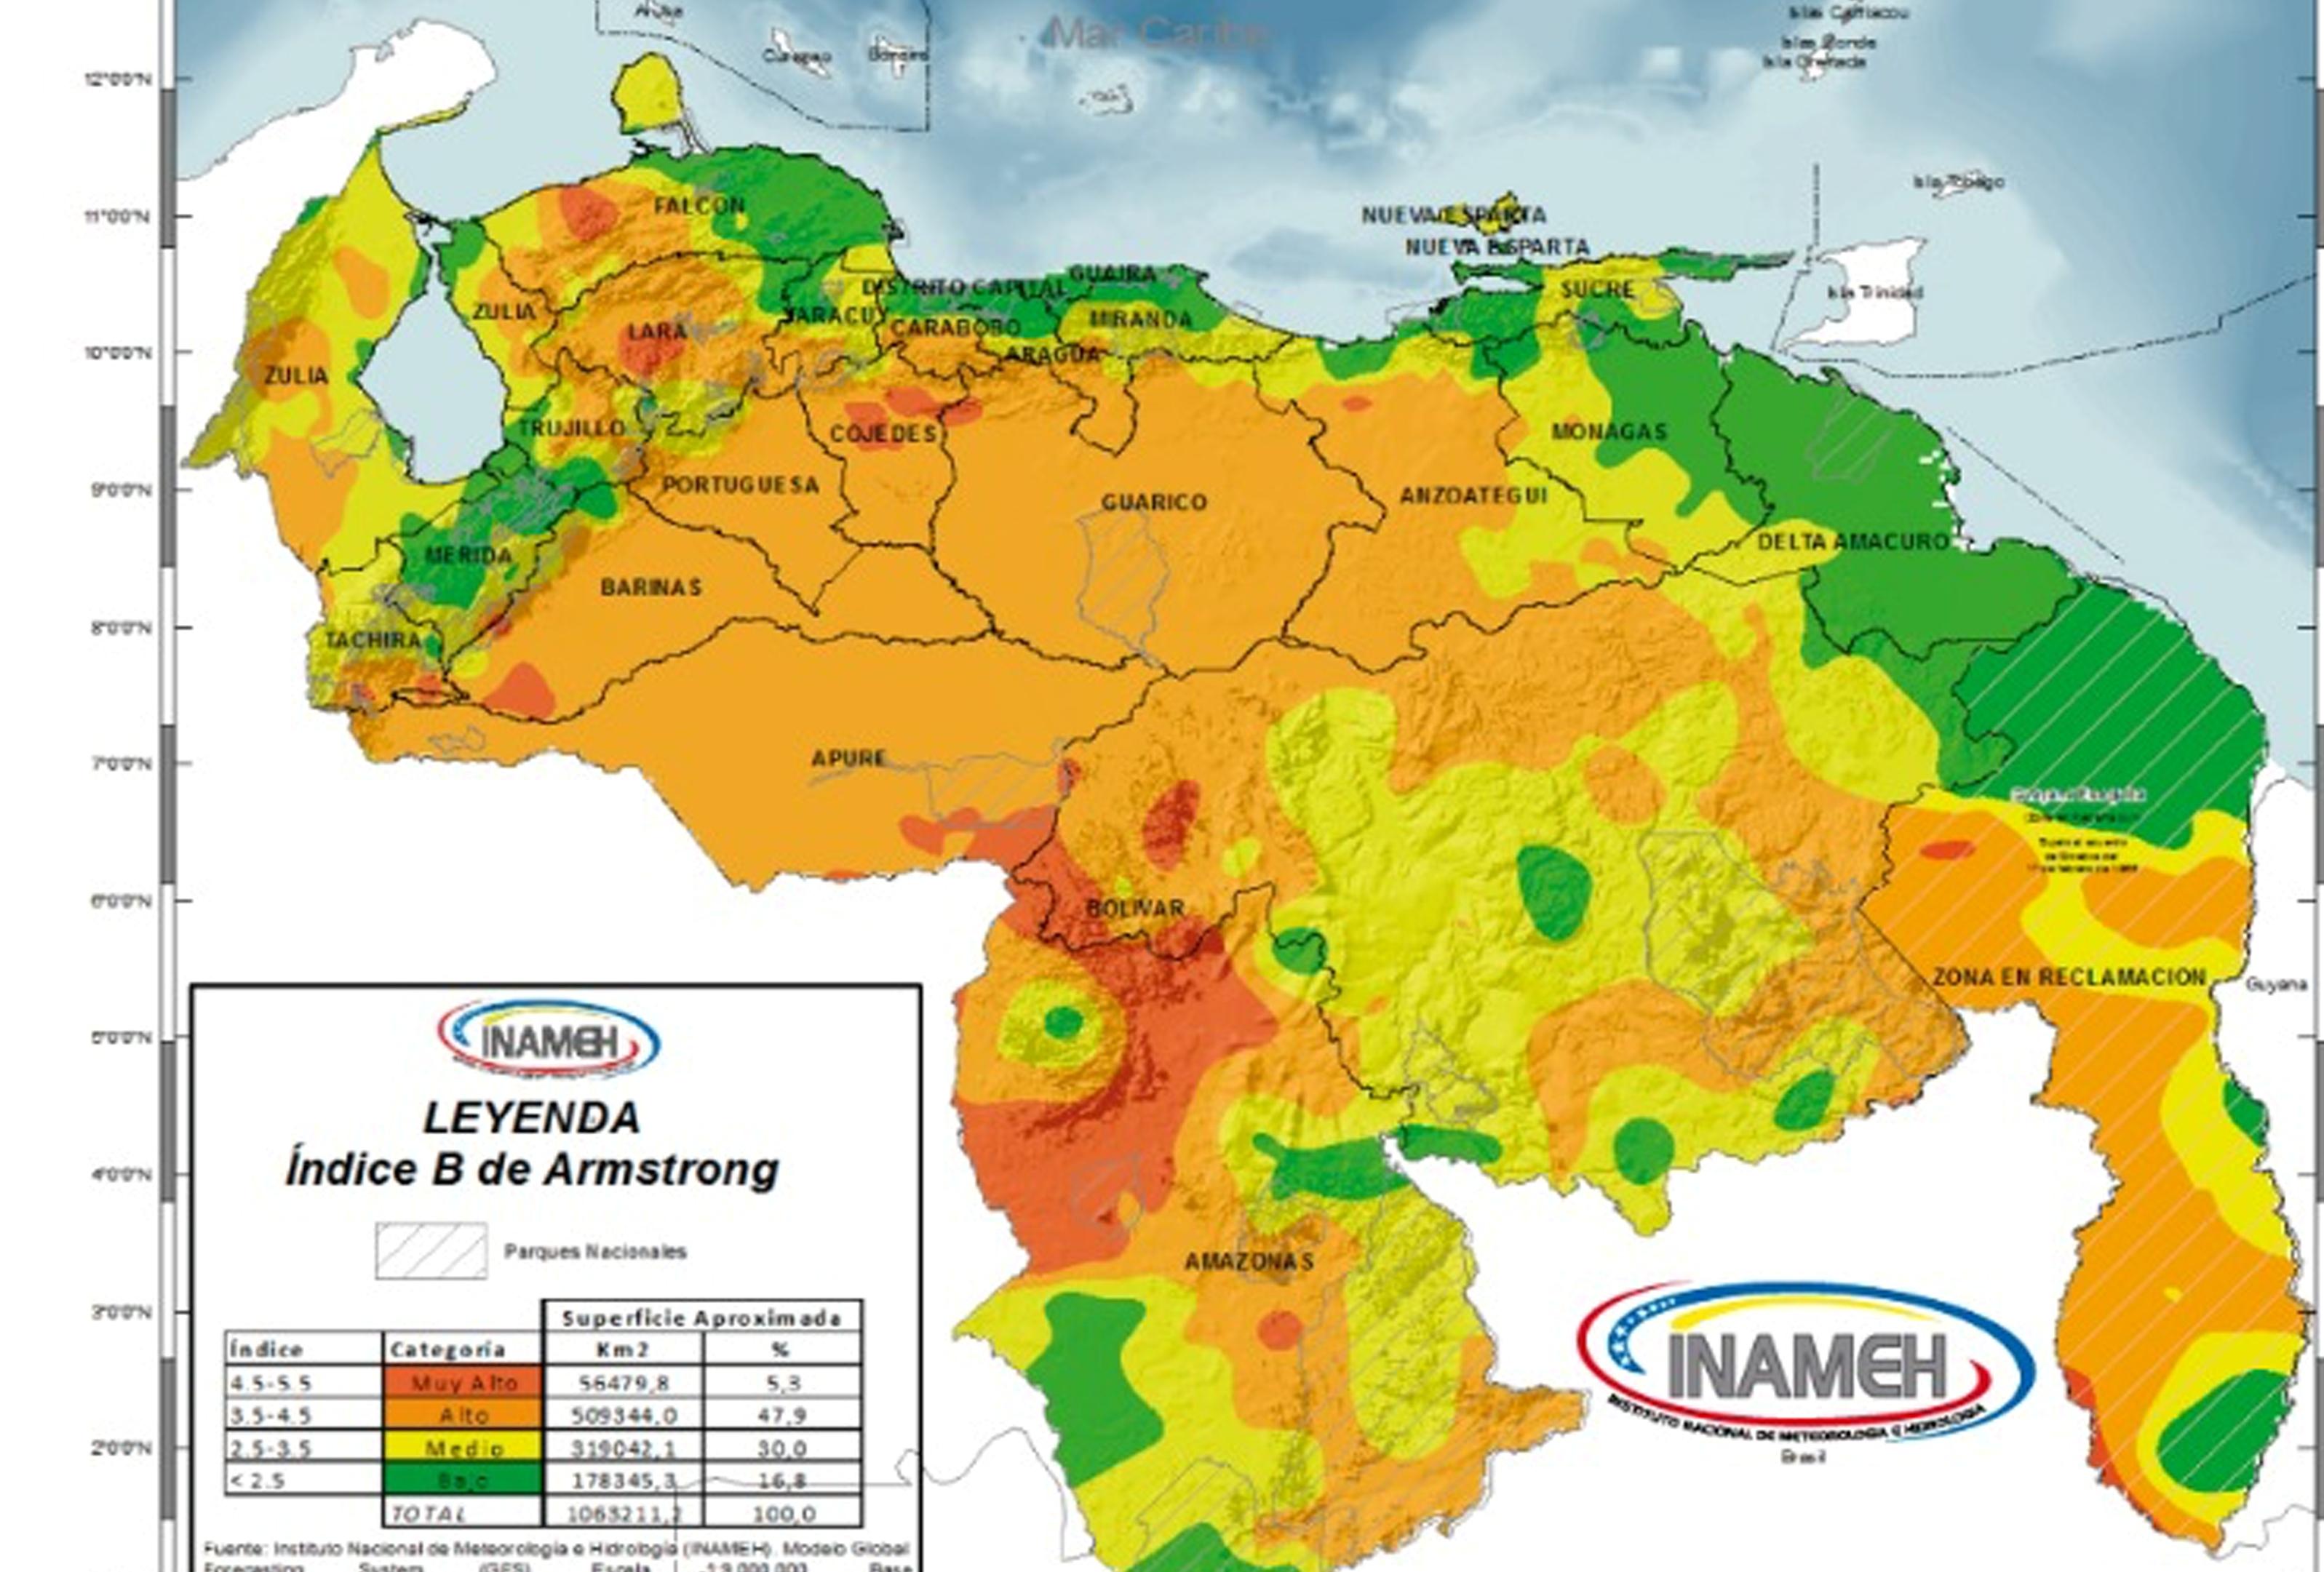 Boletines diarios emitirán datos sobre zonas vulnerables a incendios forestales